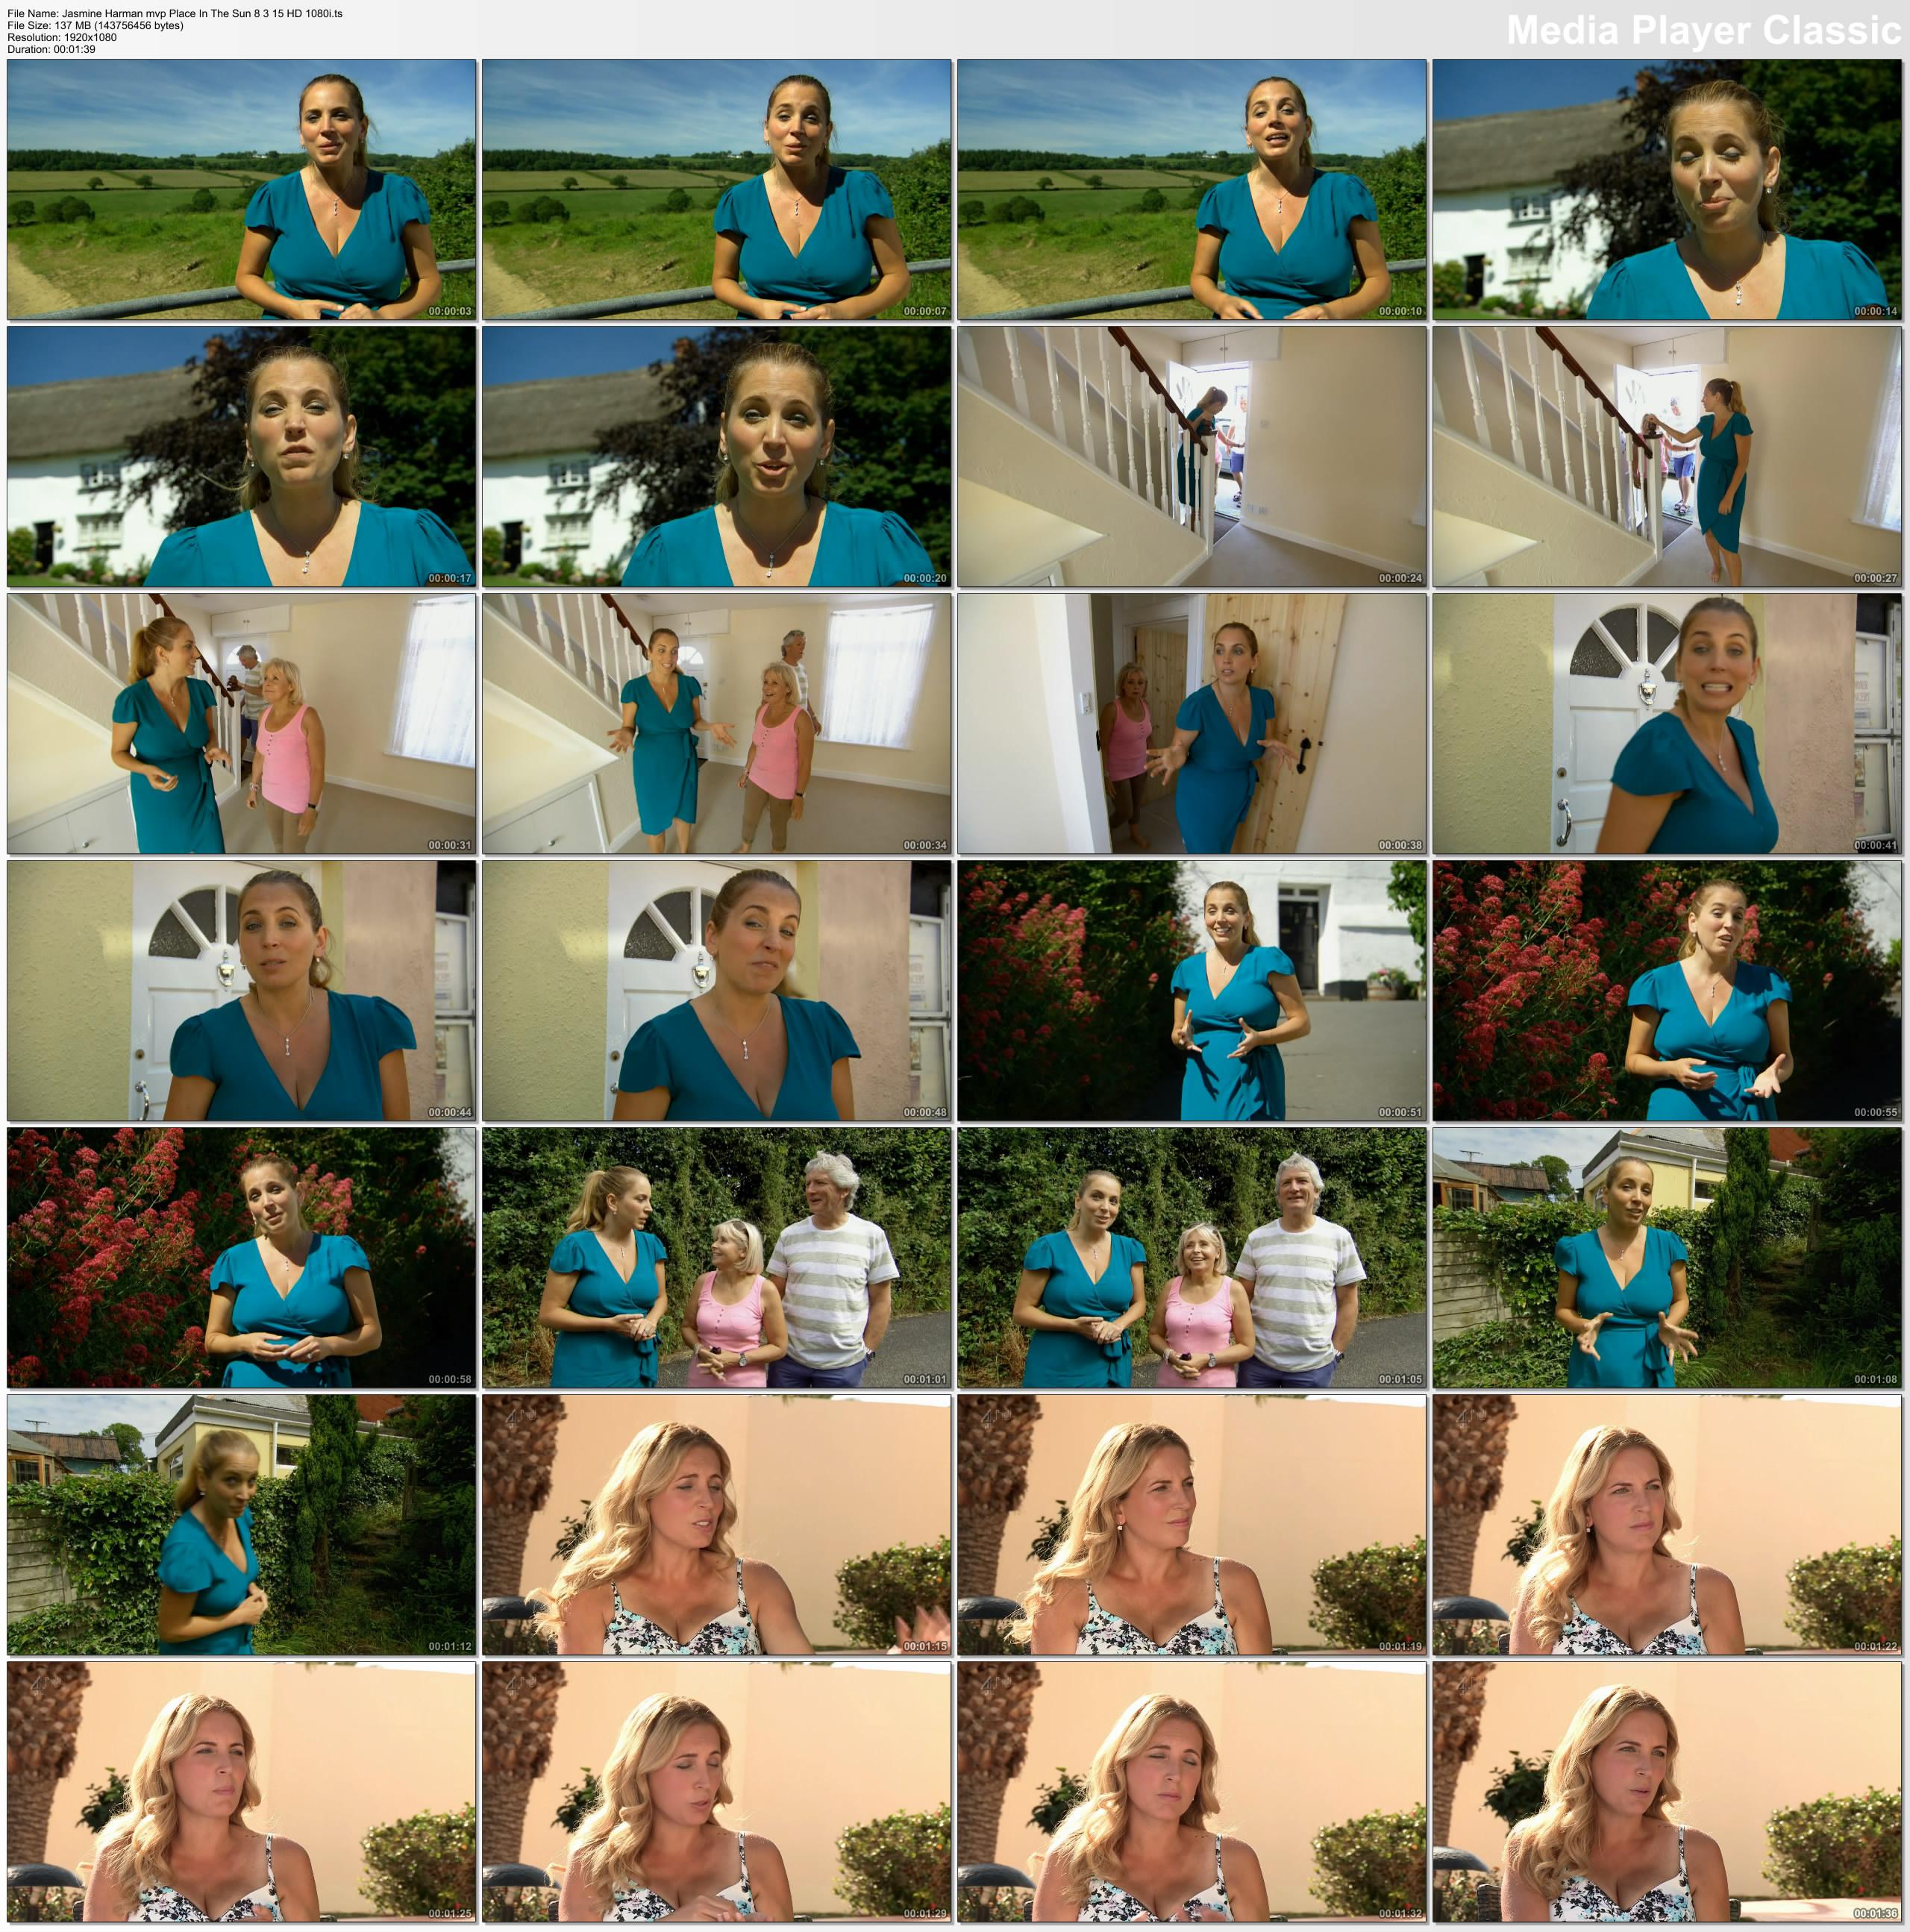 Jasmine Harman mvp Place In The Sun 8 3 15 HD 1080i.ts_thumbs.jpg